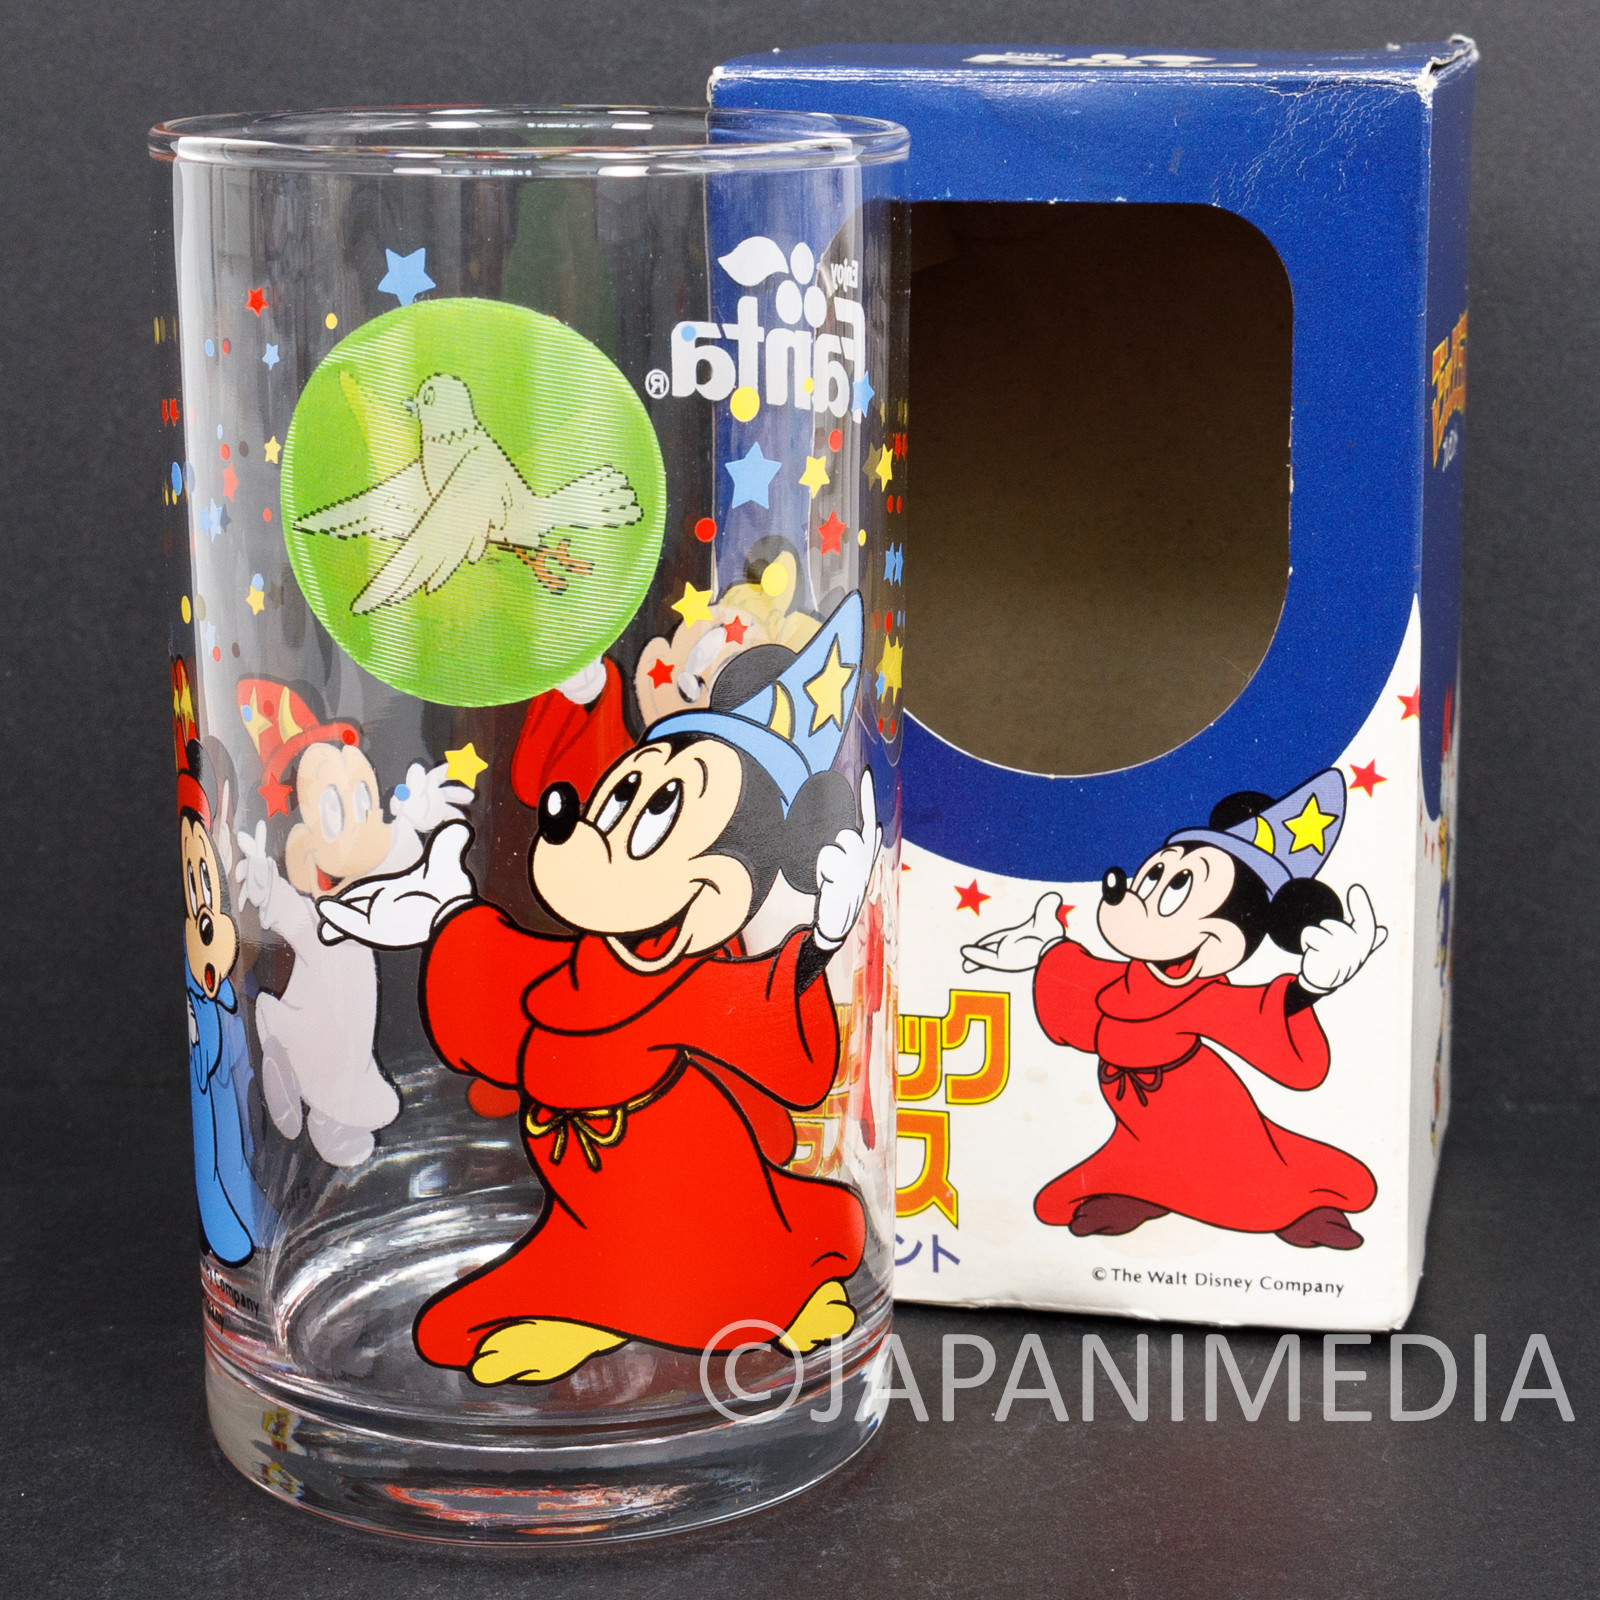 Retro Disney Fantasia Mickey Mouse Glass Coca-Cola FANTA JAPAN